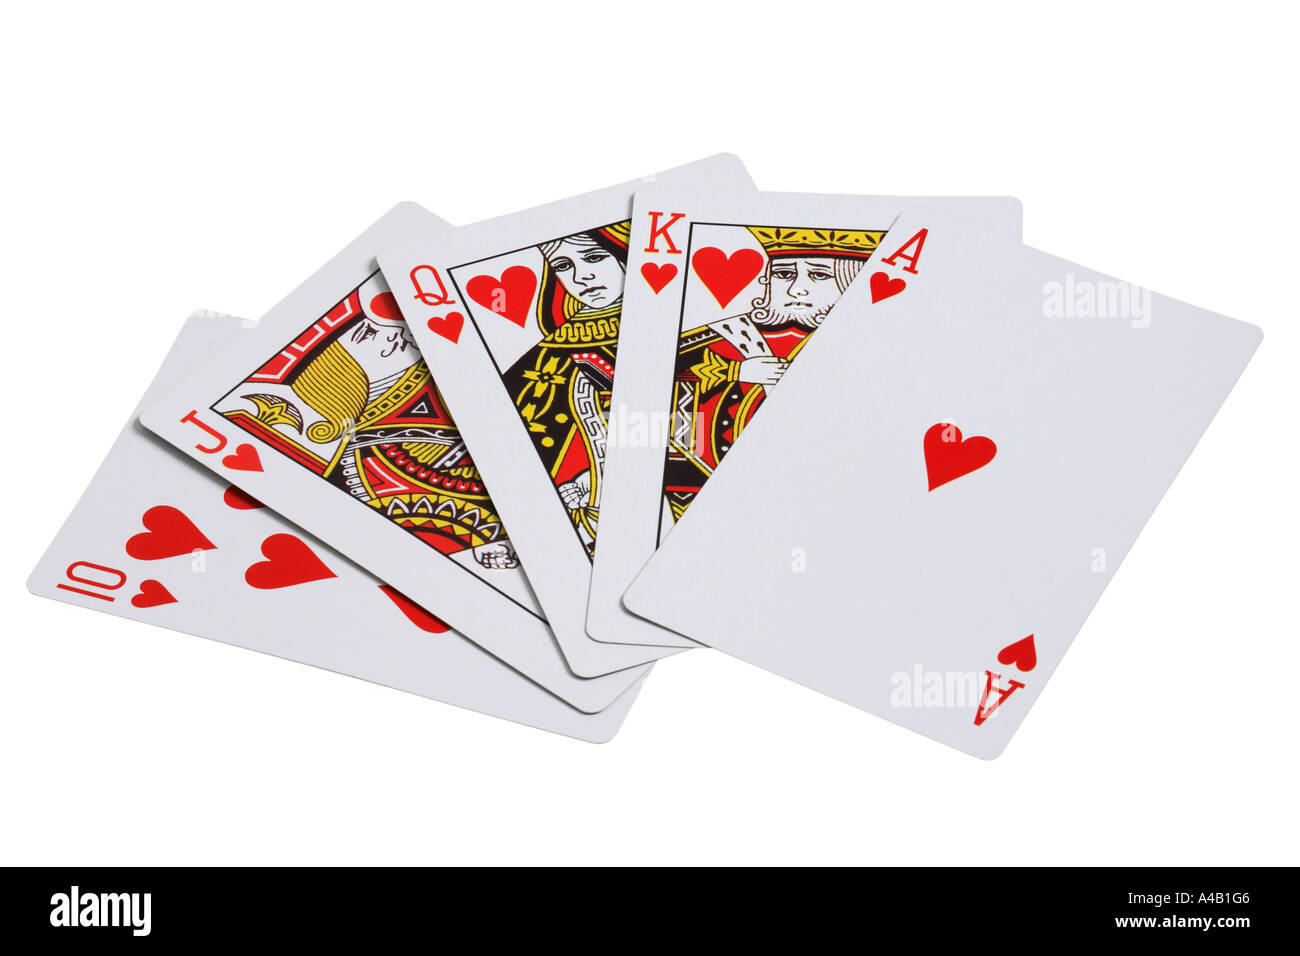 Ff9 gambling